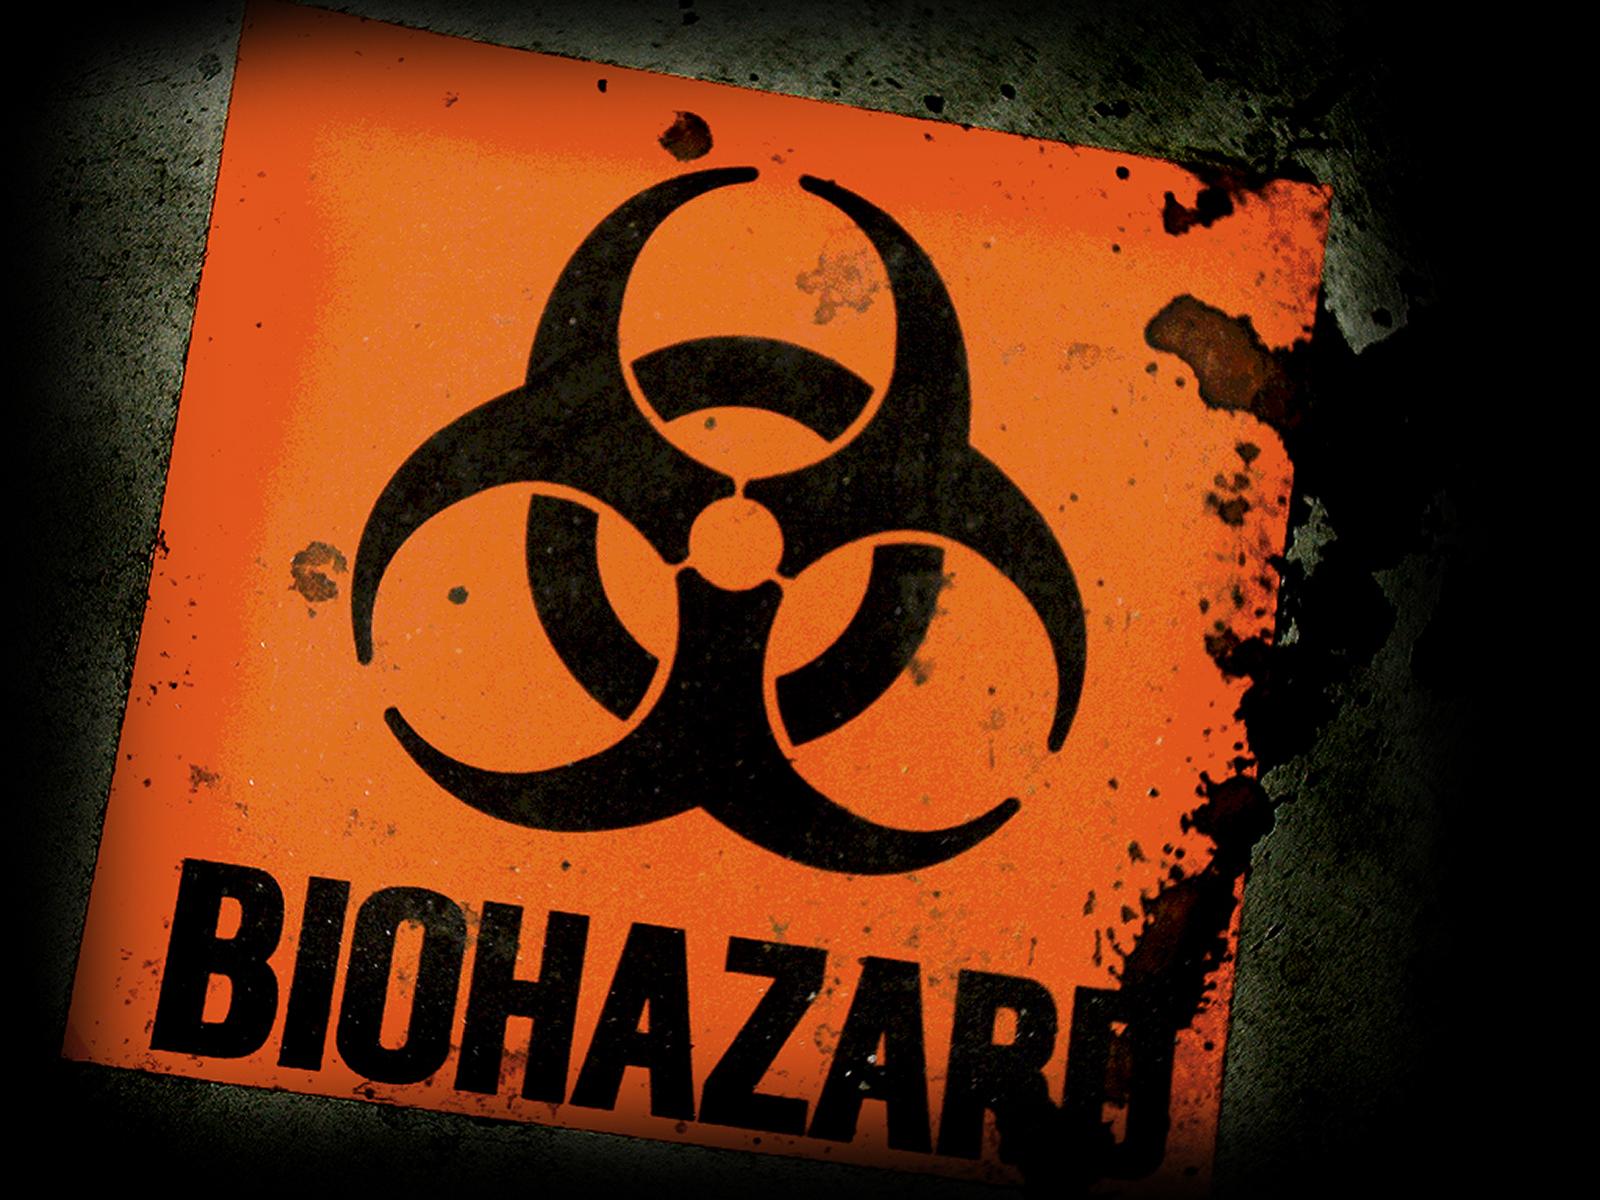 Biohazard Warning Signs Logo HD Wallpapers Desktop Wallpapers 1600x1200